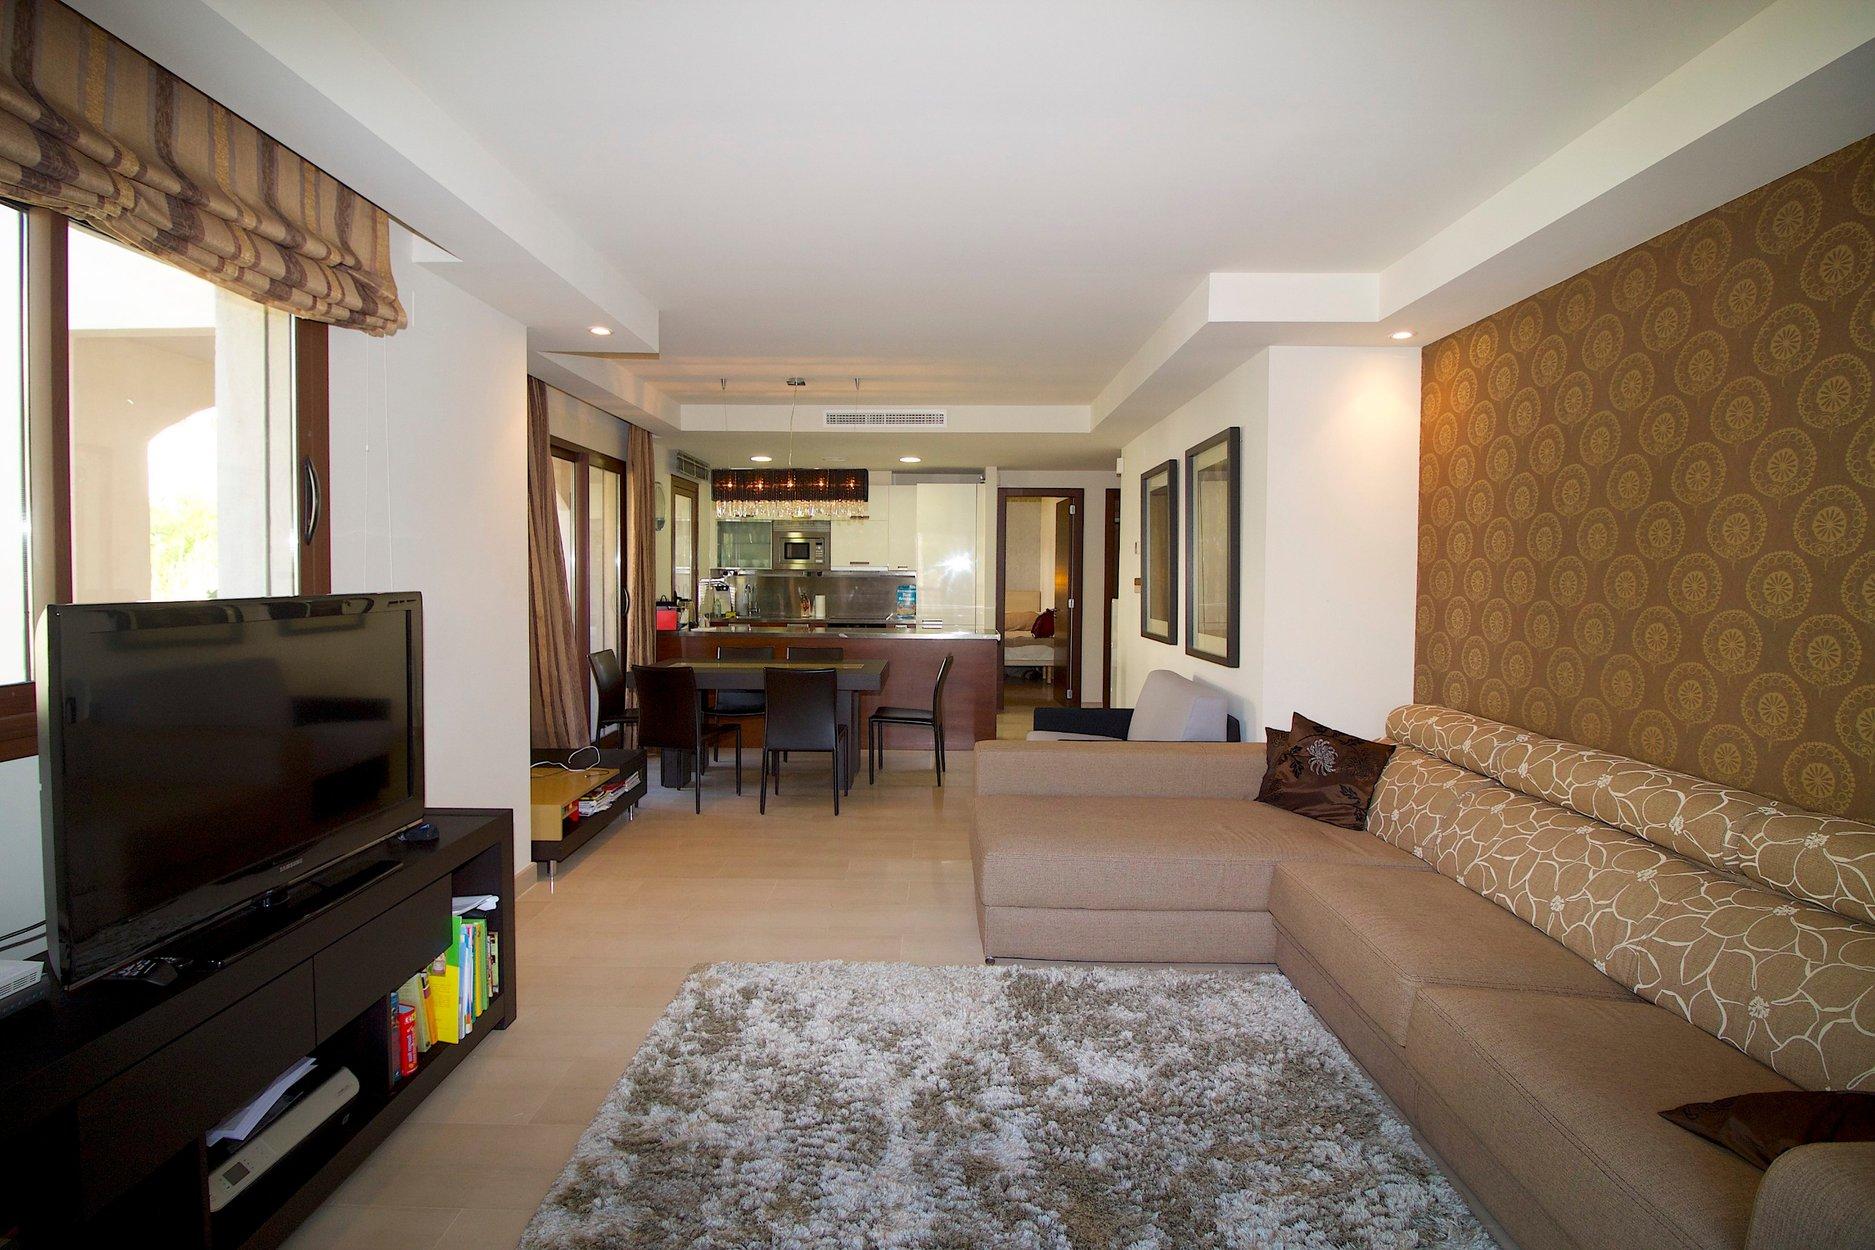 2 Bedroom Bathroom Apartment For Sale In Medina De Bans Puerto Banus Marbella